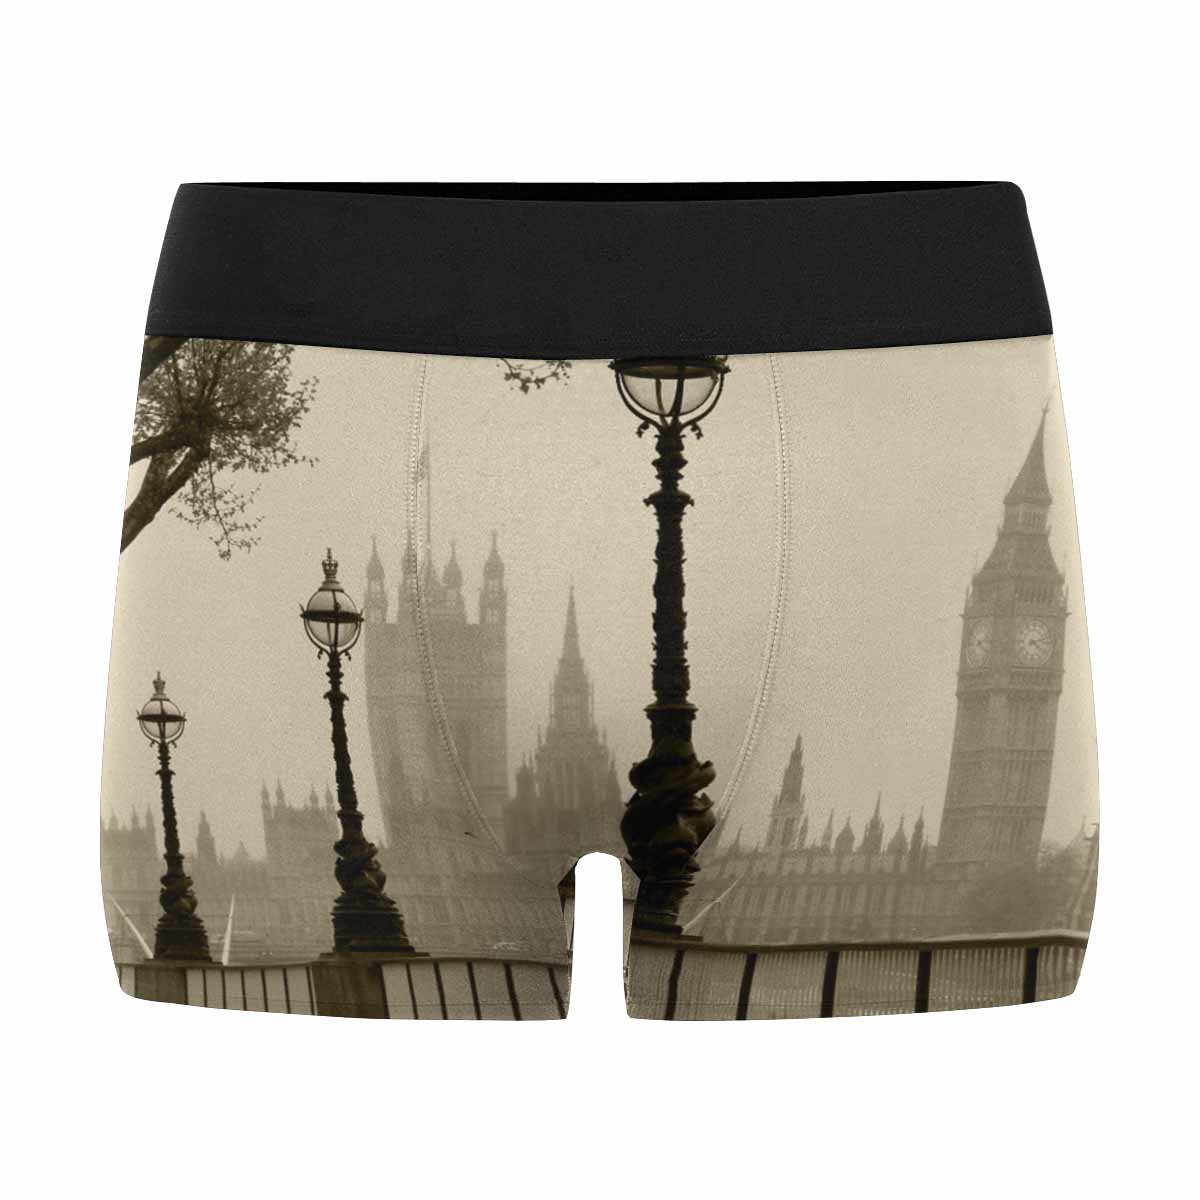 INTERESTPRINT Mens All-Over Print Boxer Briefs Big Ben /& Houses of Parliament London in Fog XS-3XL